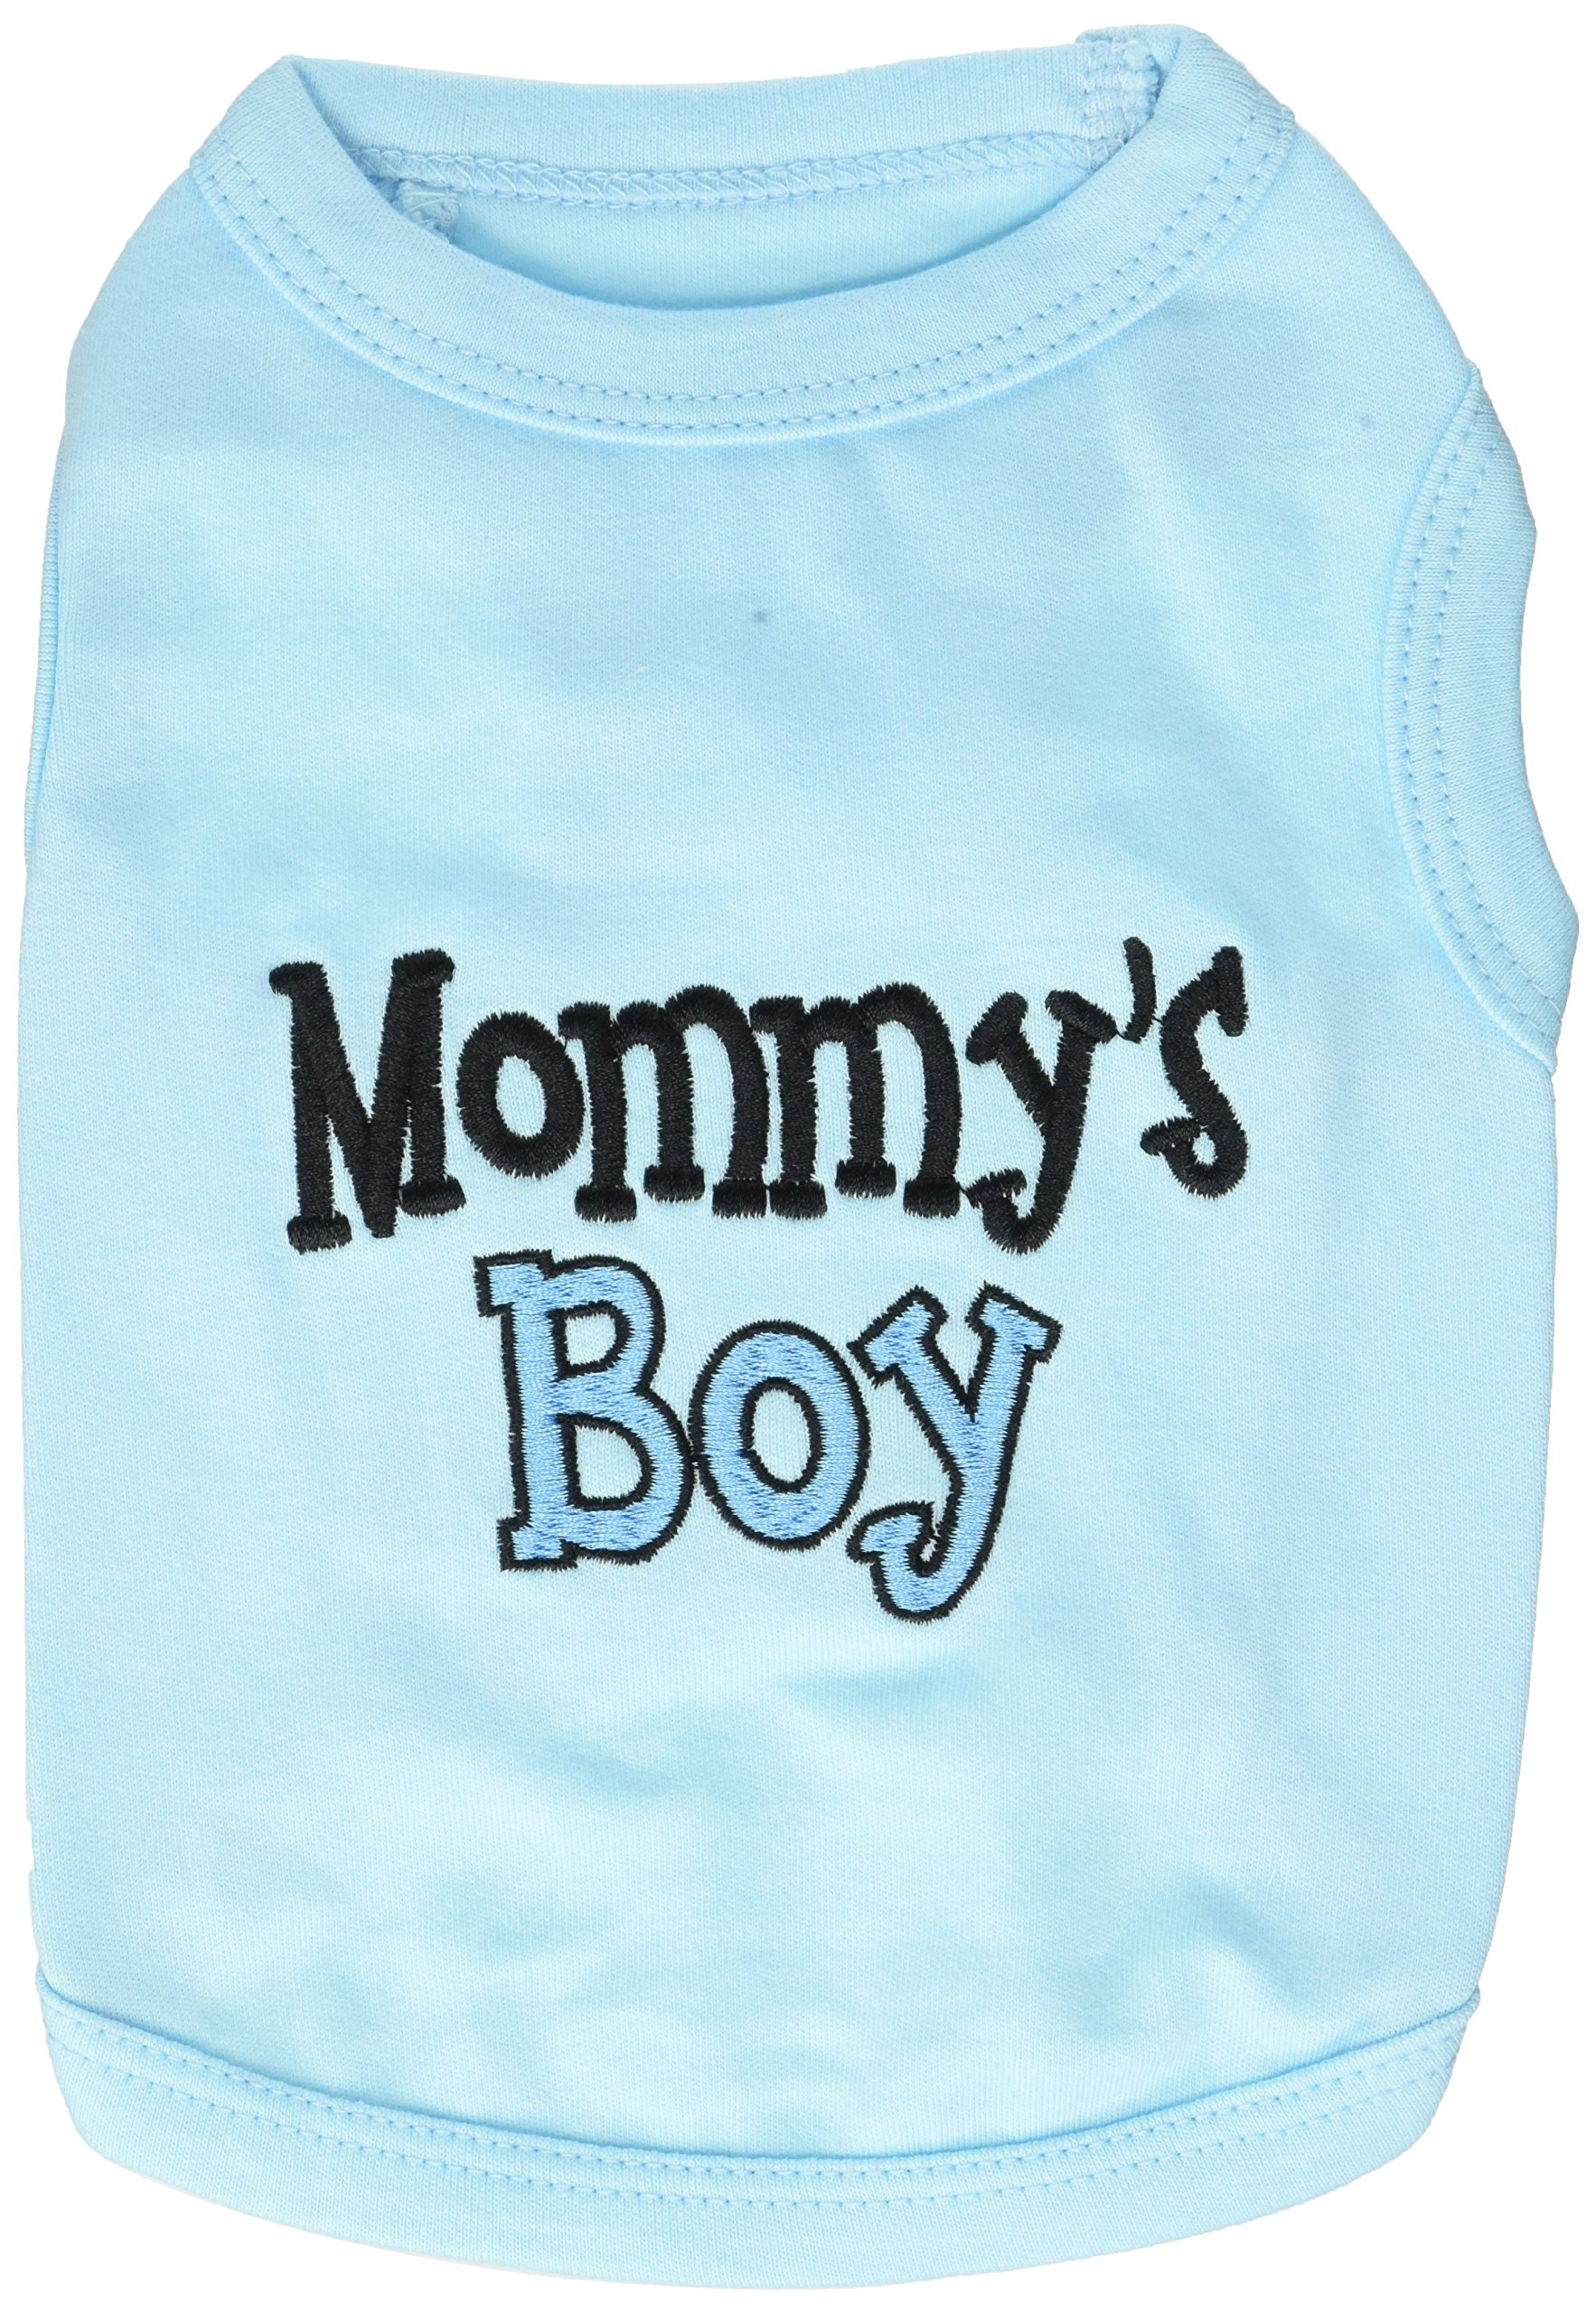 Parisian Pet Mommy's Boy T-Shirt, Small